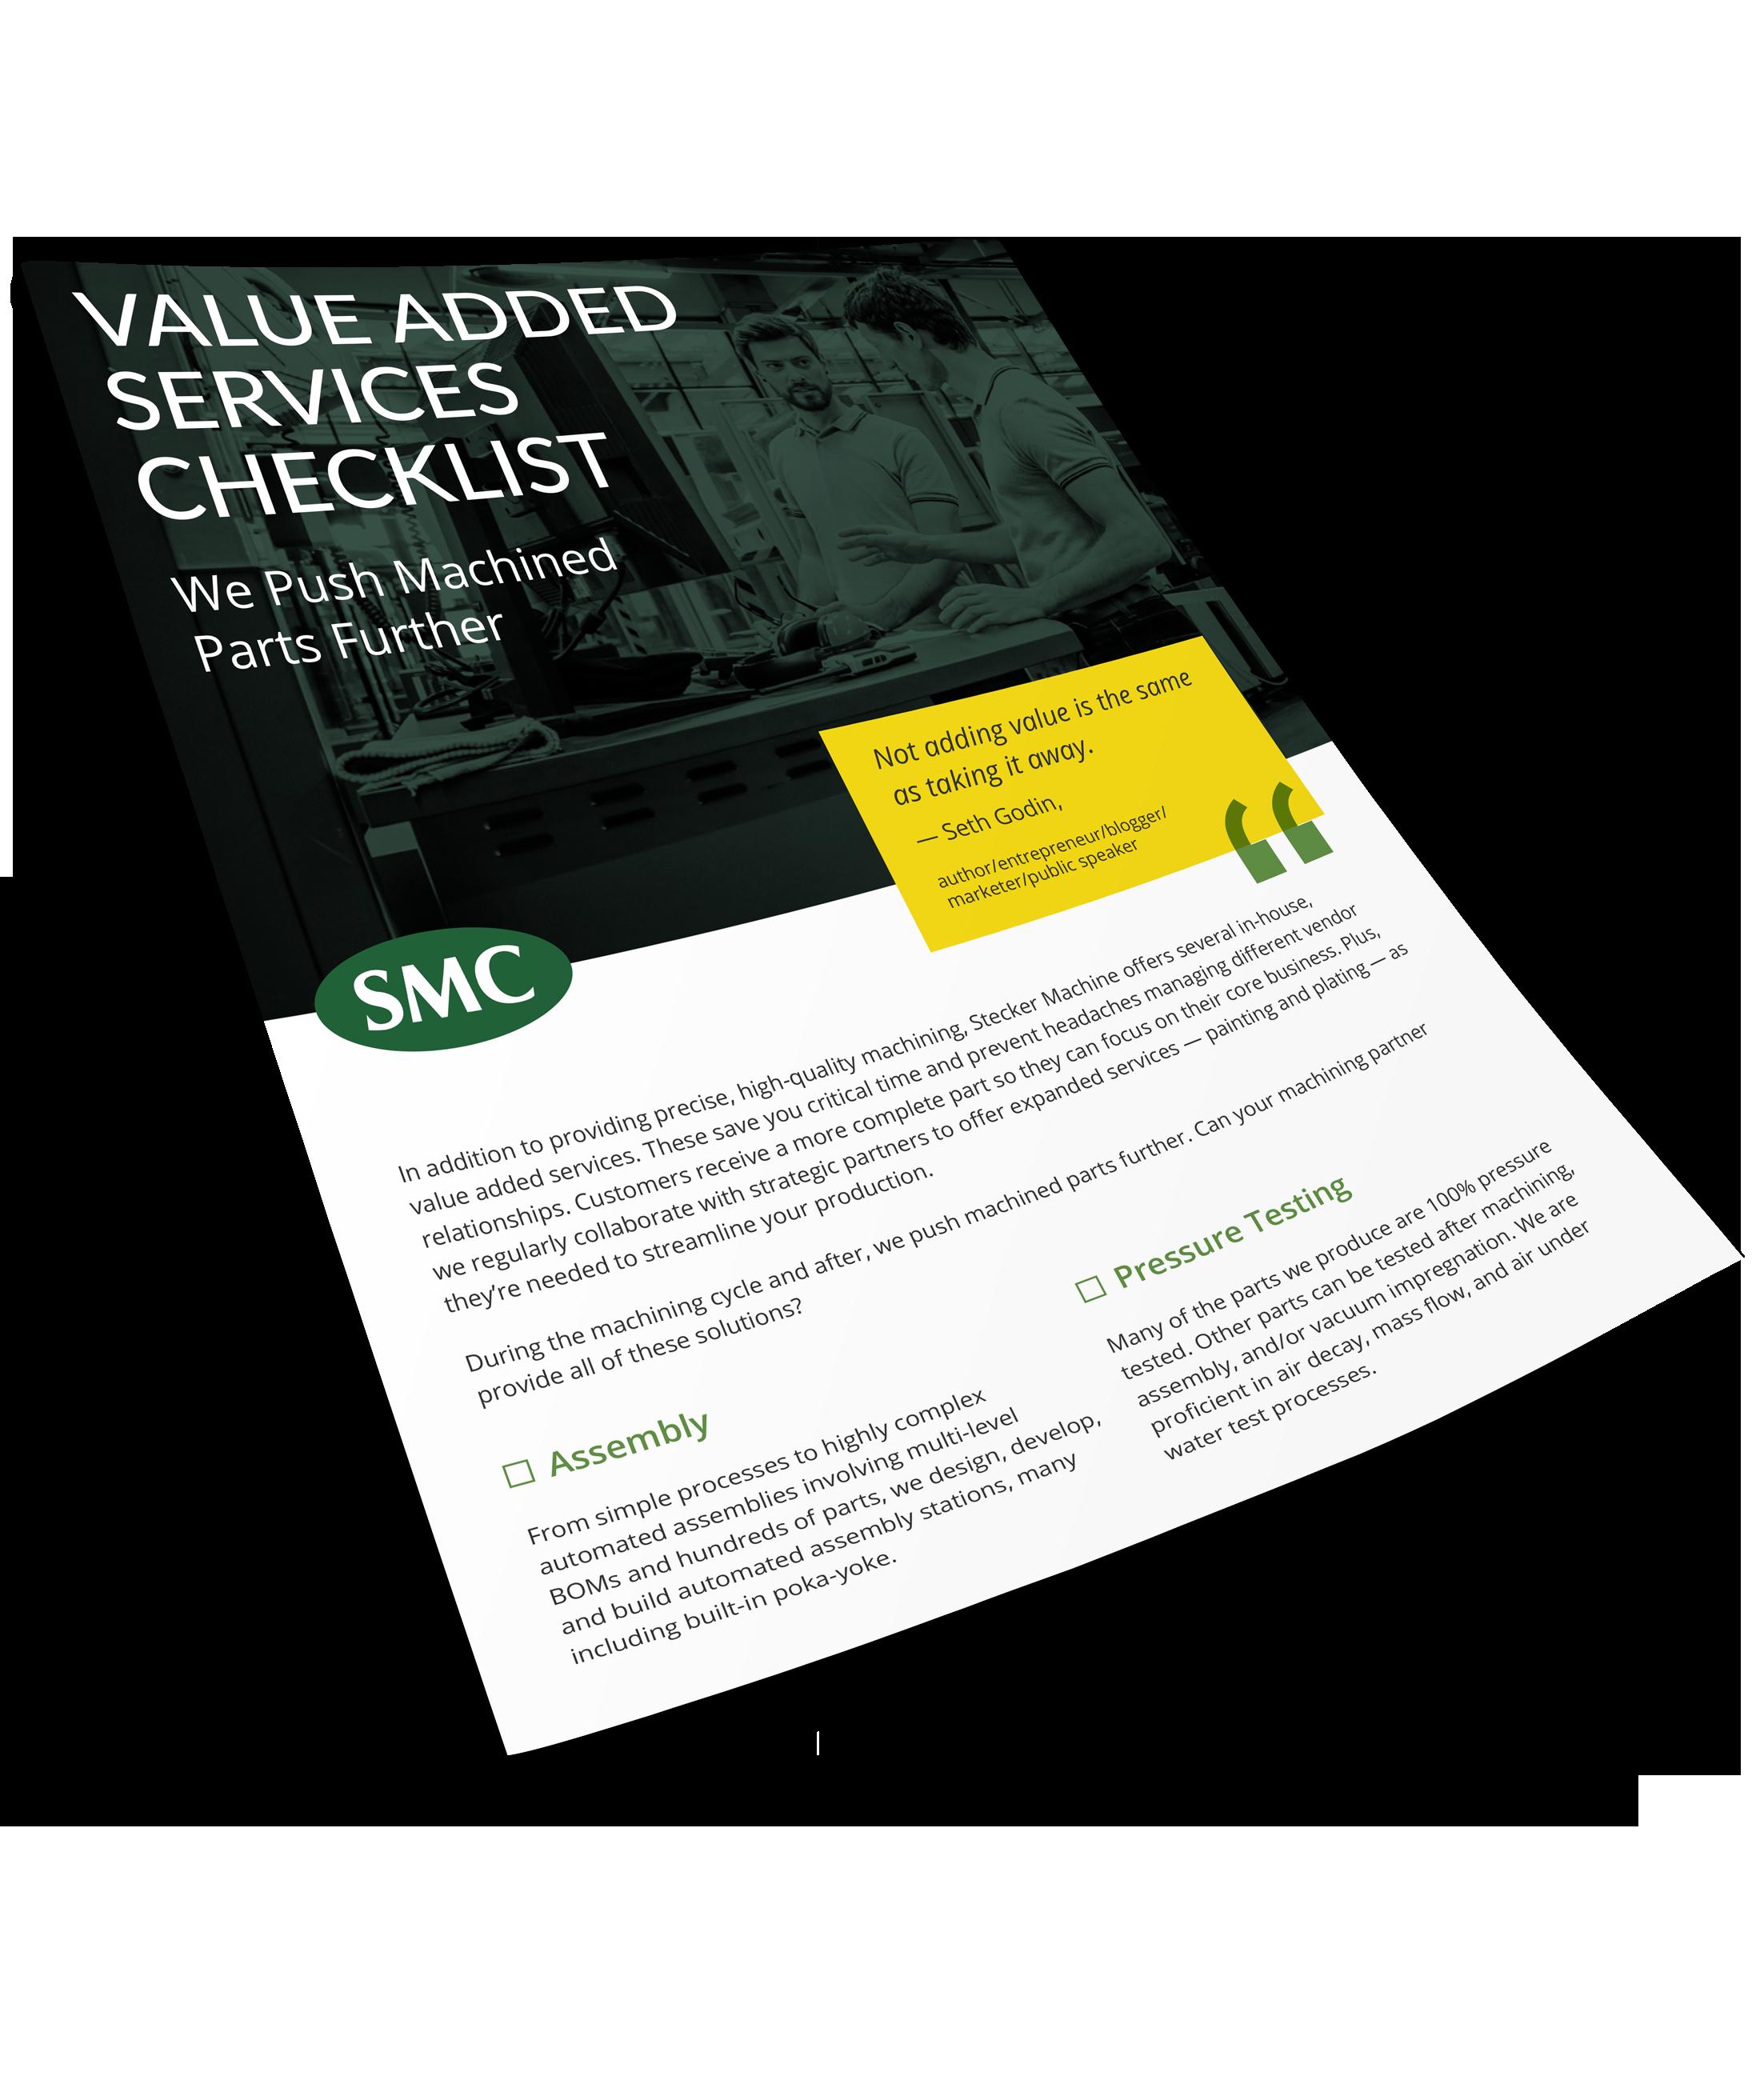 Value_Added_Services_Checklist_LP-Image